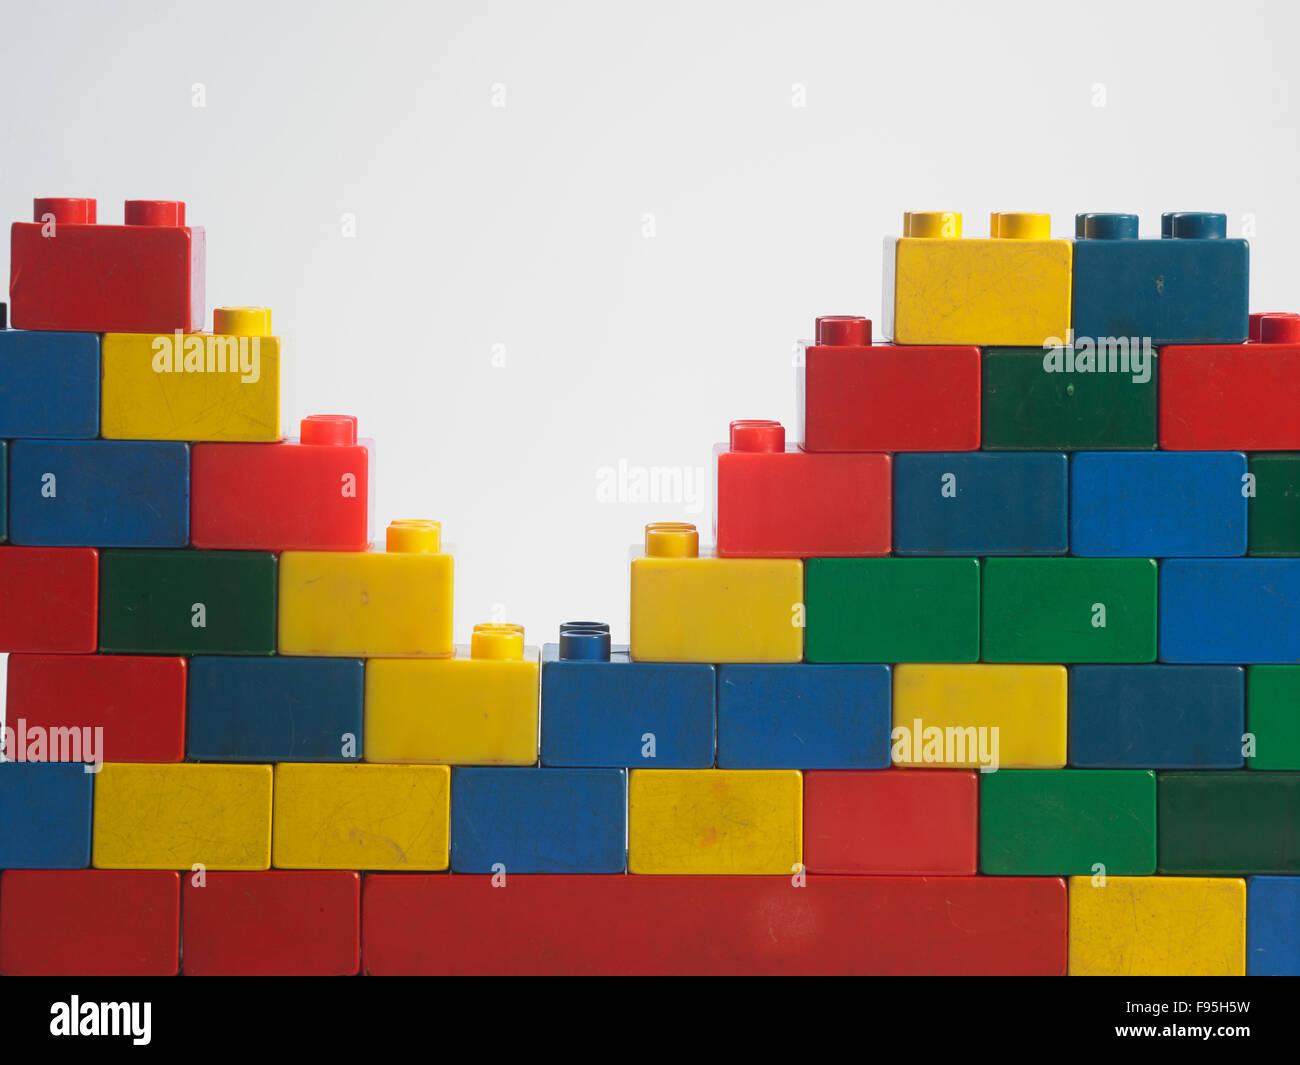 Plastic building blocks, isolated on white Stock Photo: 91706997 - Alamy